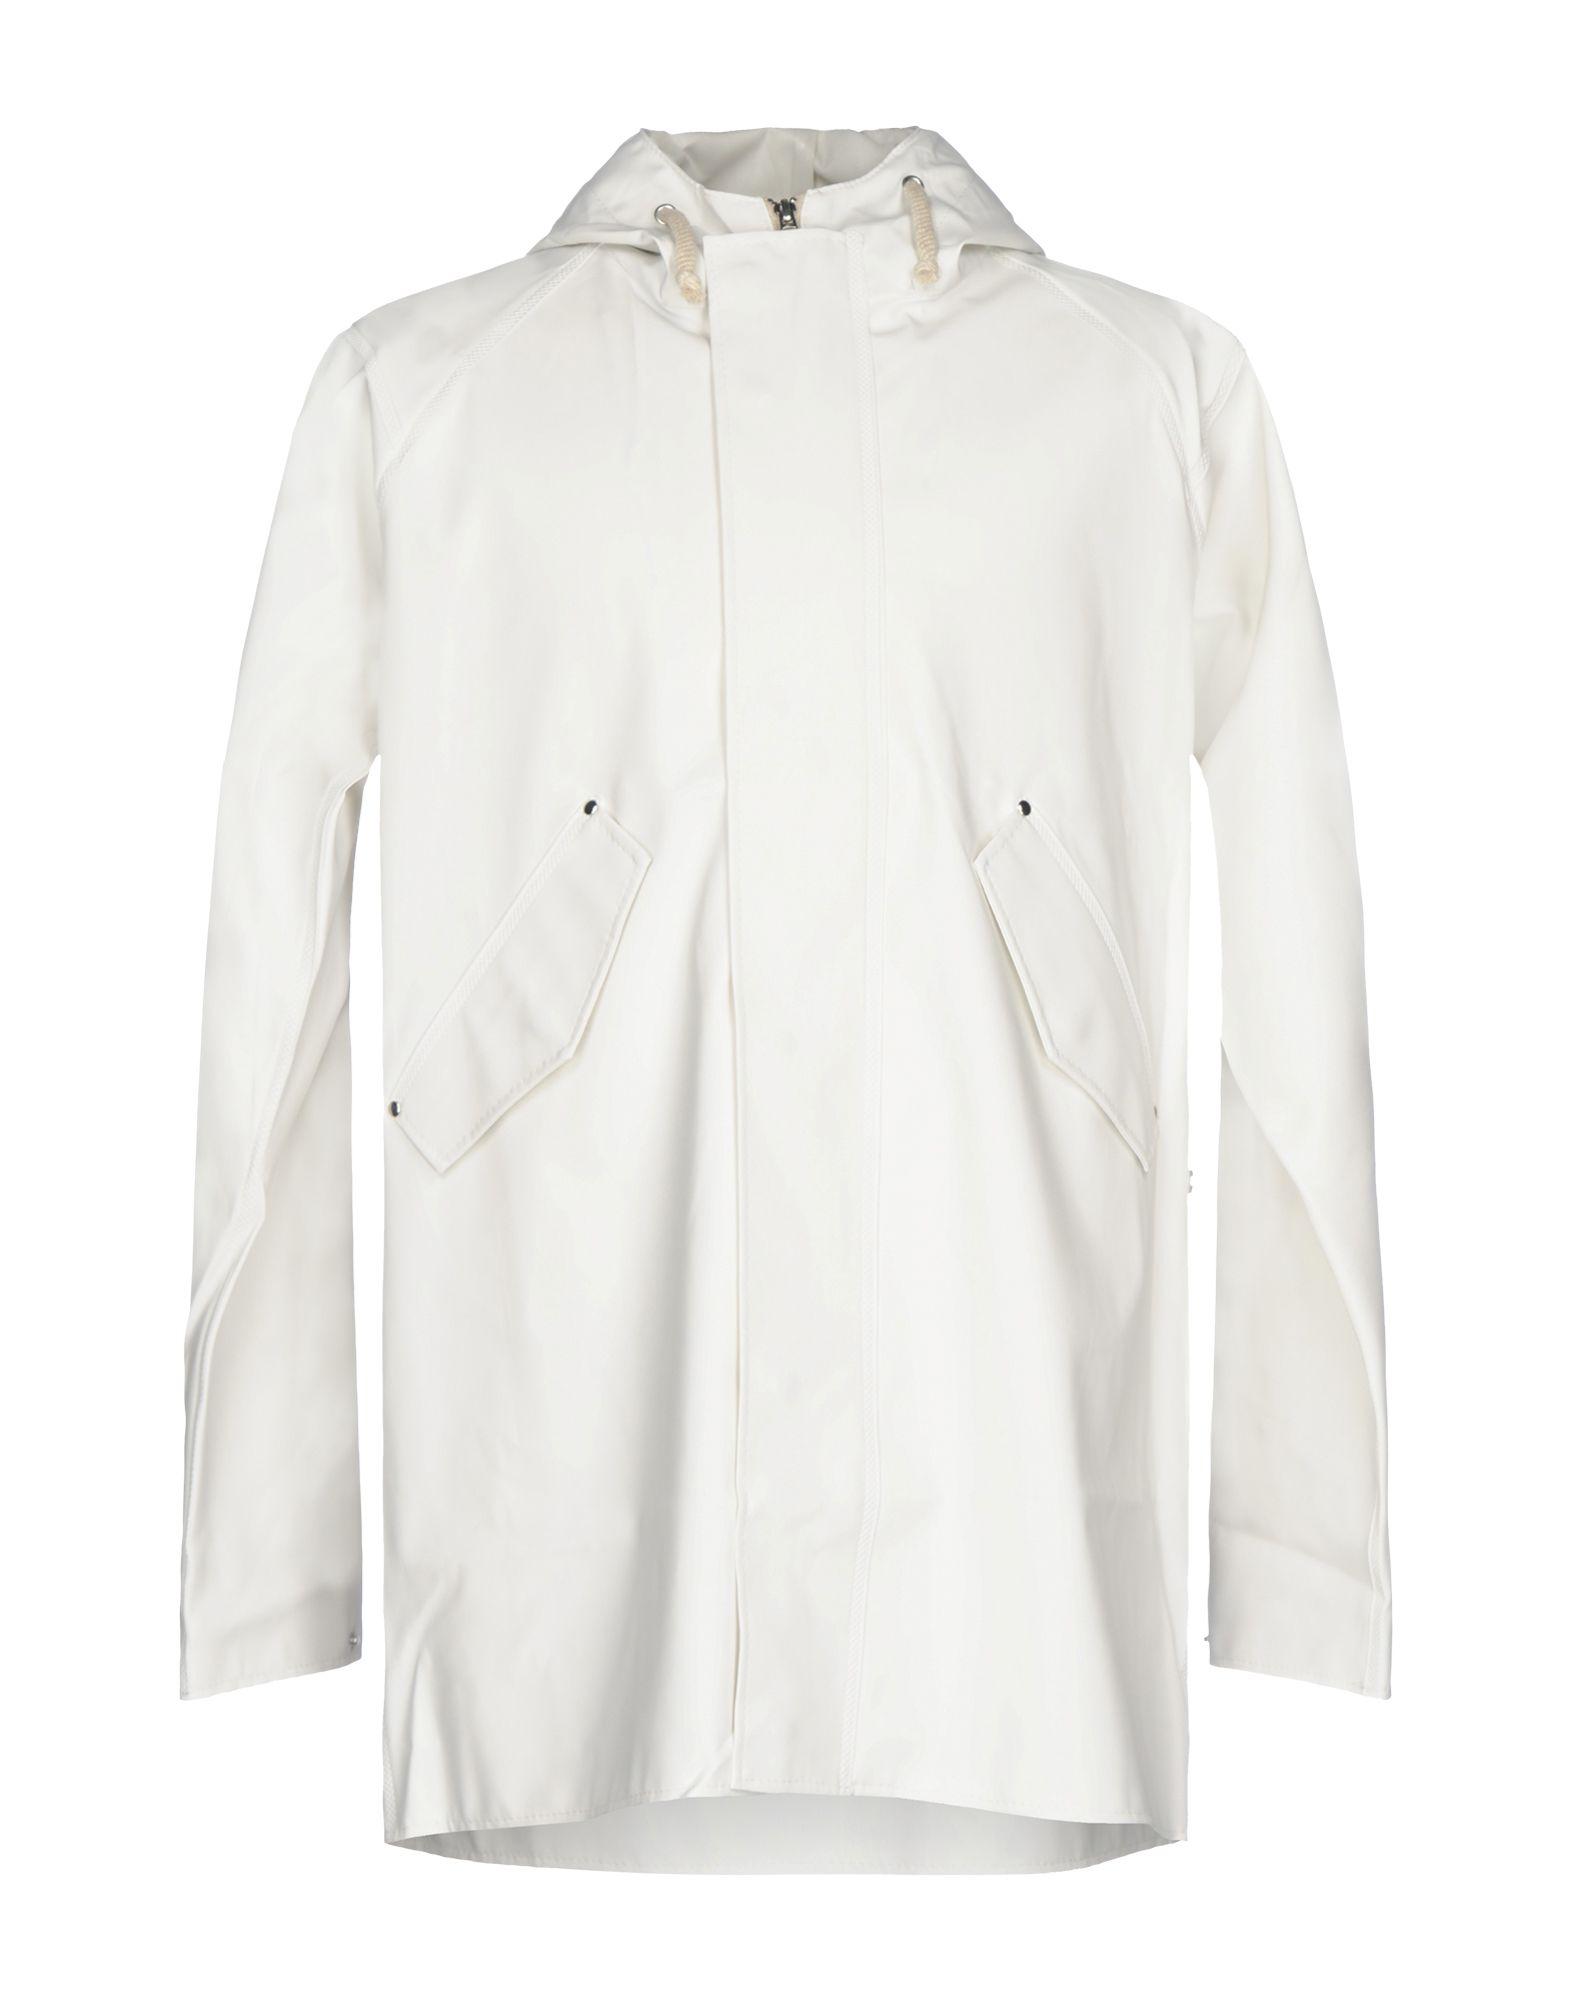 ELKA Jacket in White